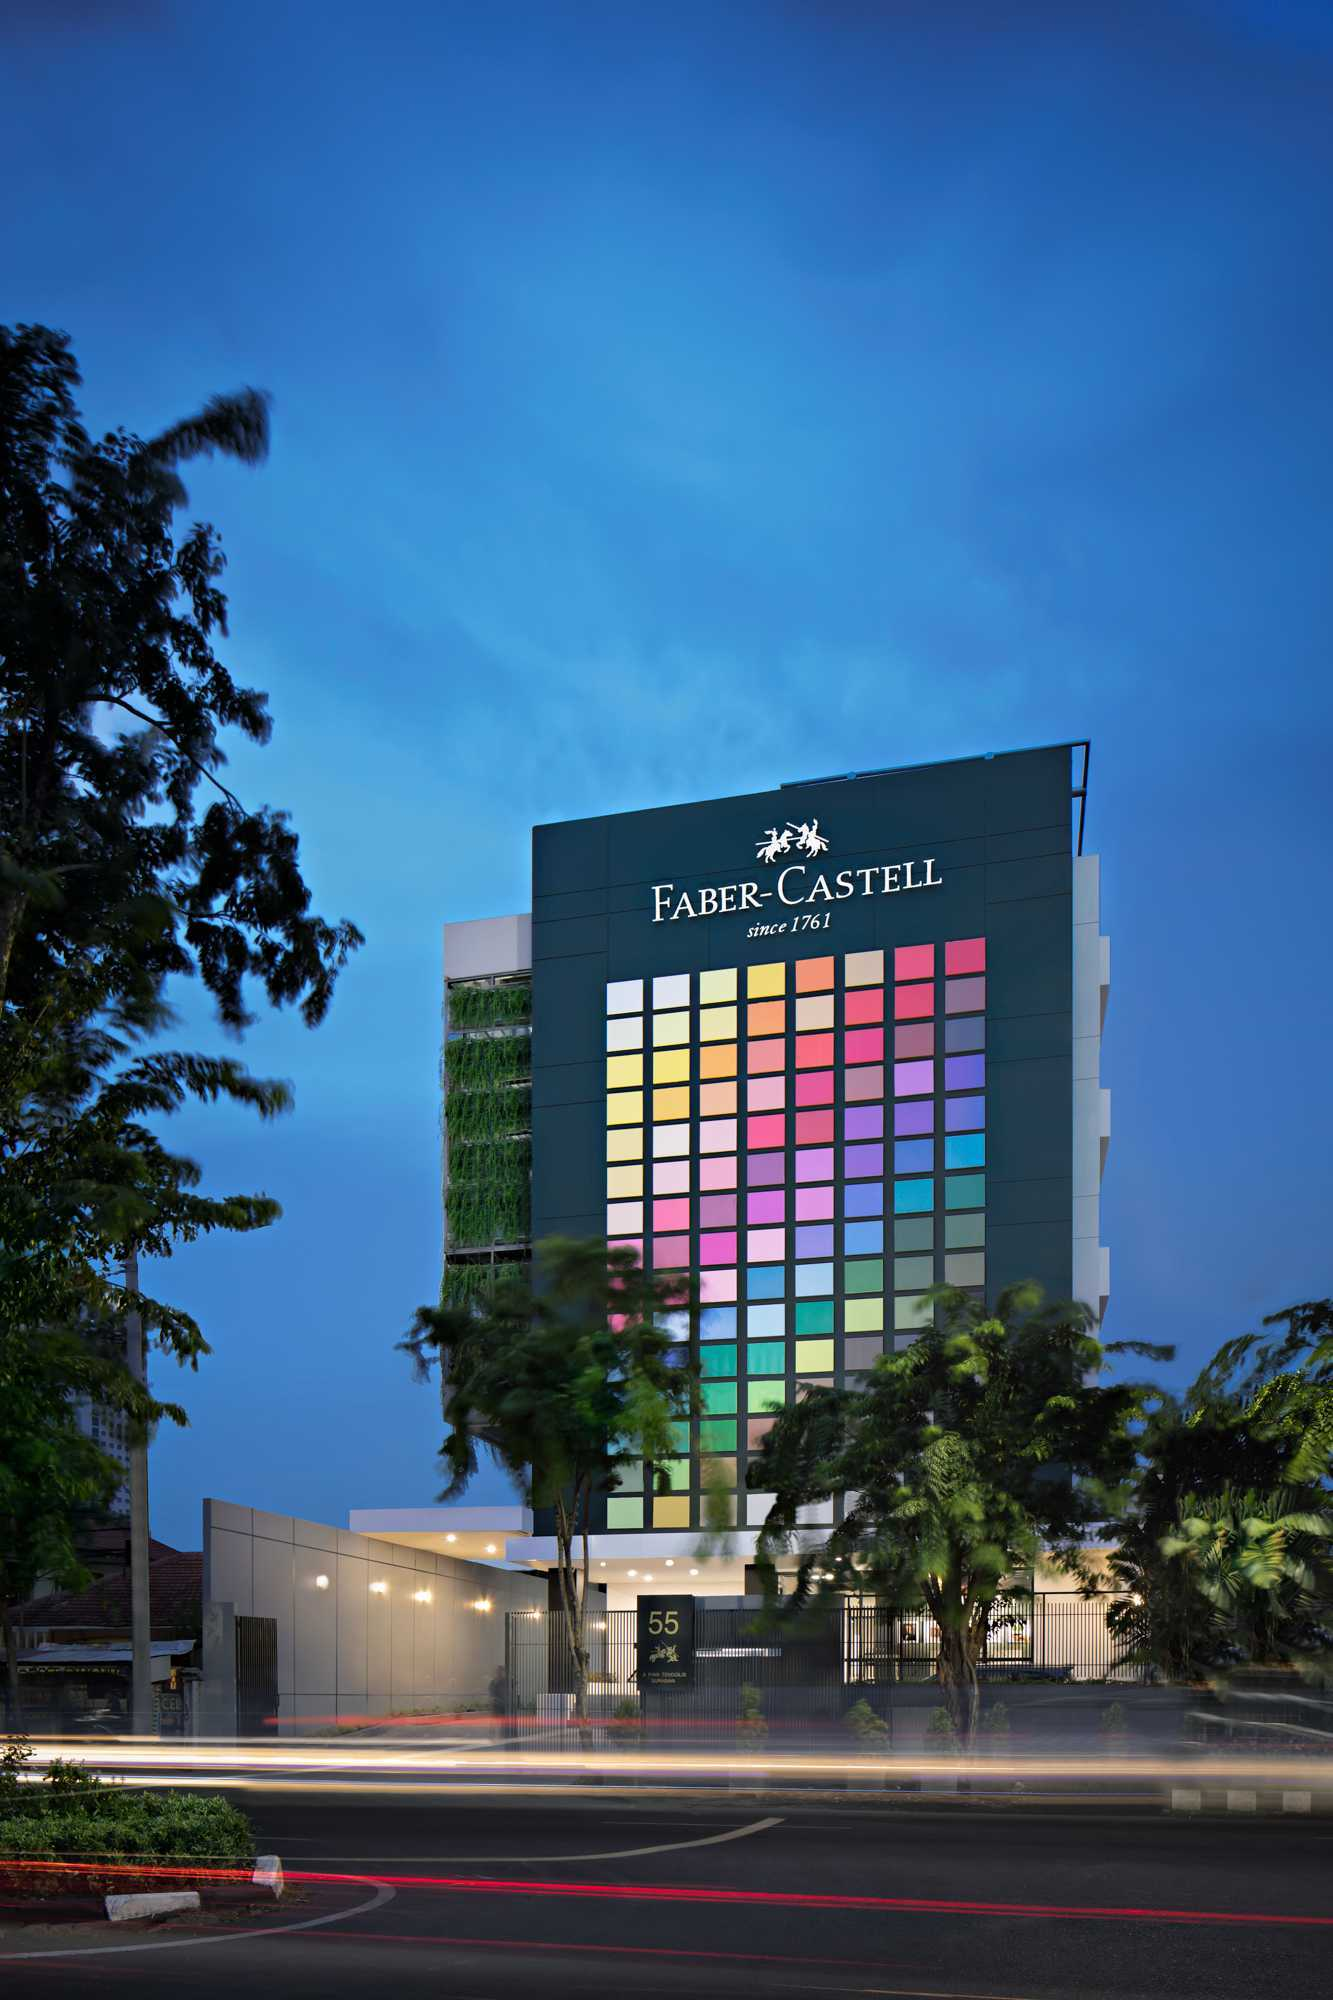 Best Group Design Studio Faber Castell International - Surabaya Surabaya, Kota Sby, Jawa Timur, Indonesia Surabaya, Kota Sby, Jawa Timur, Indonesia Best-Group-Design-Studio-Faber-Castell-International-Surabaya Modern 88491